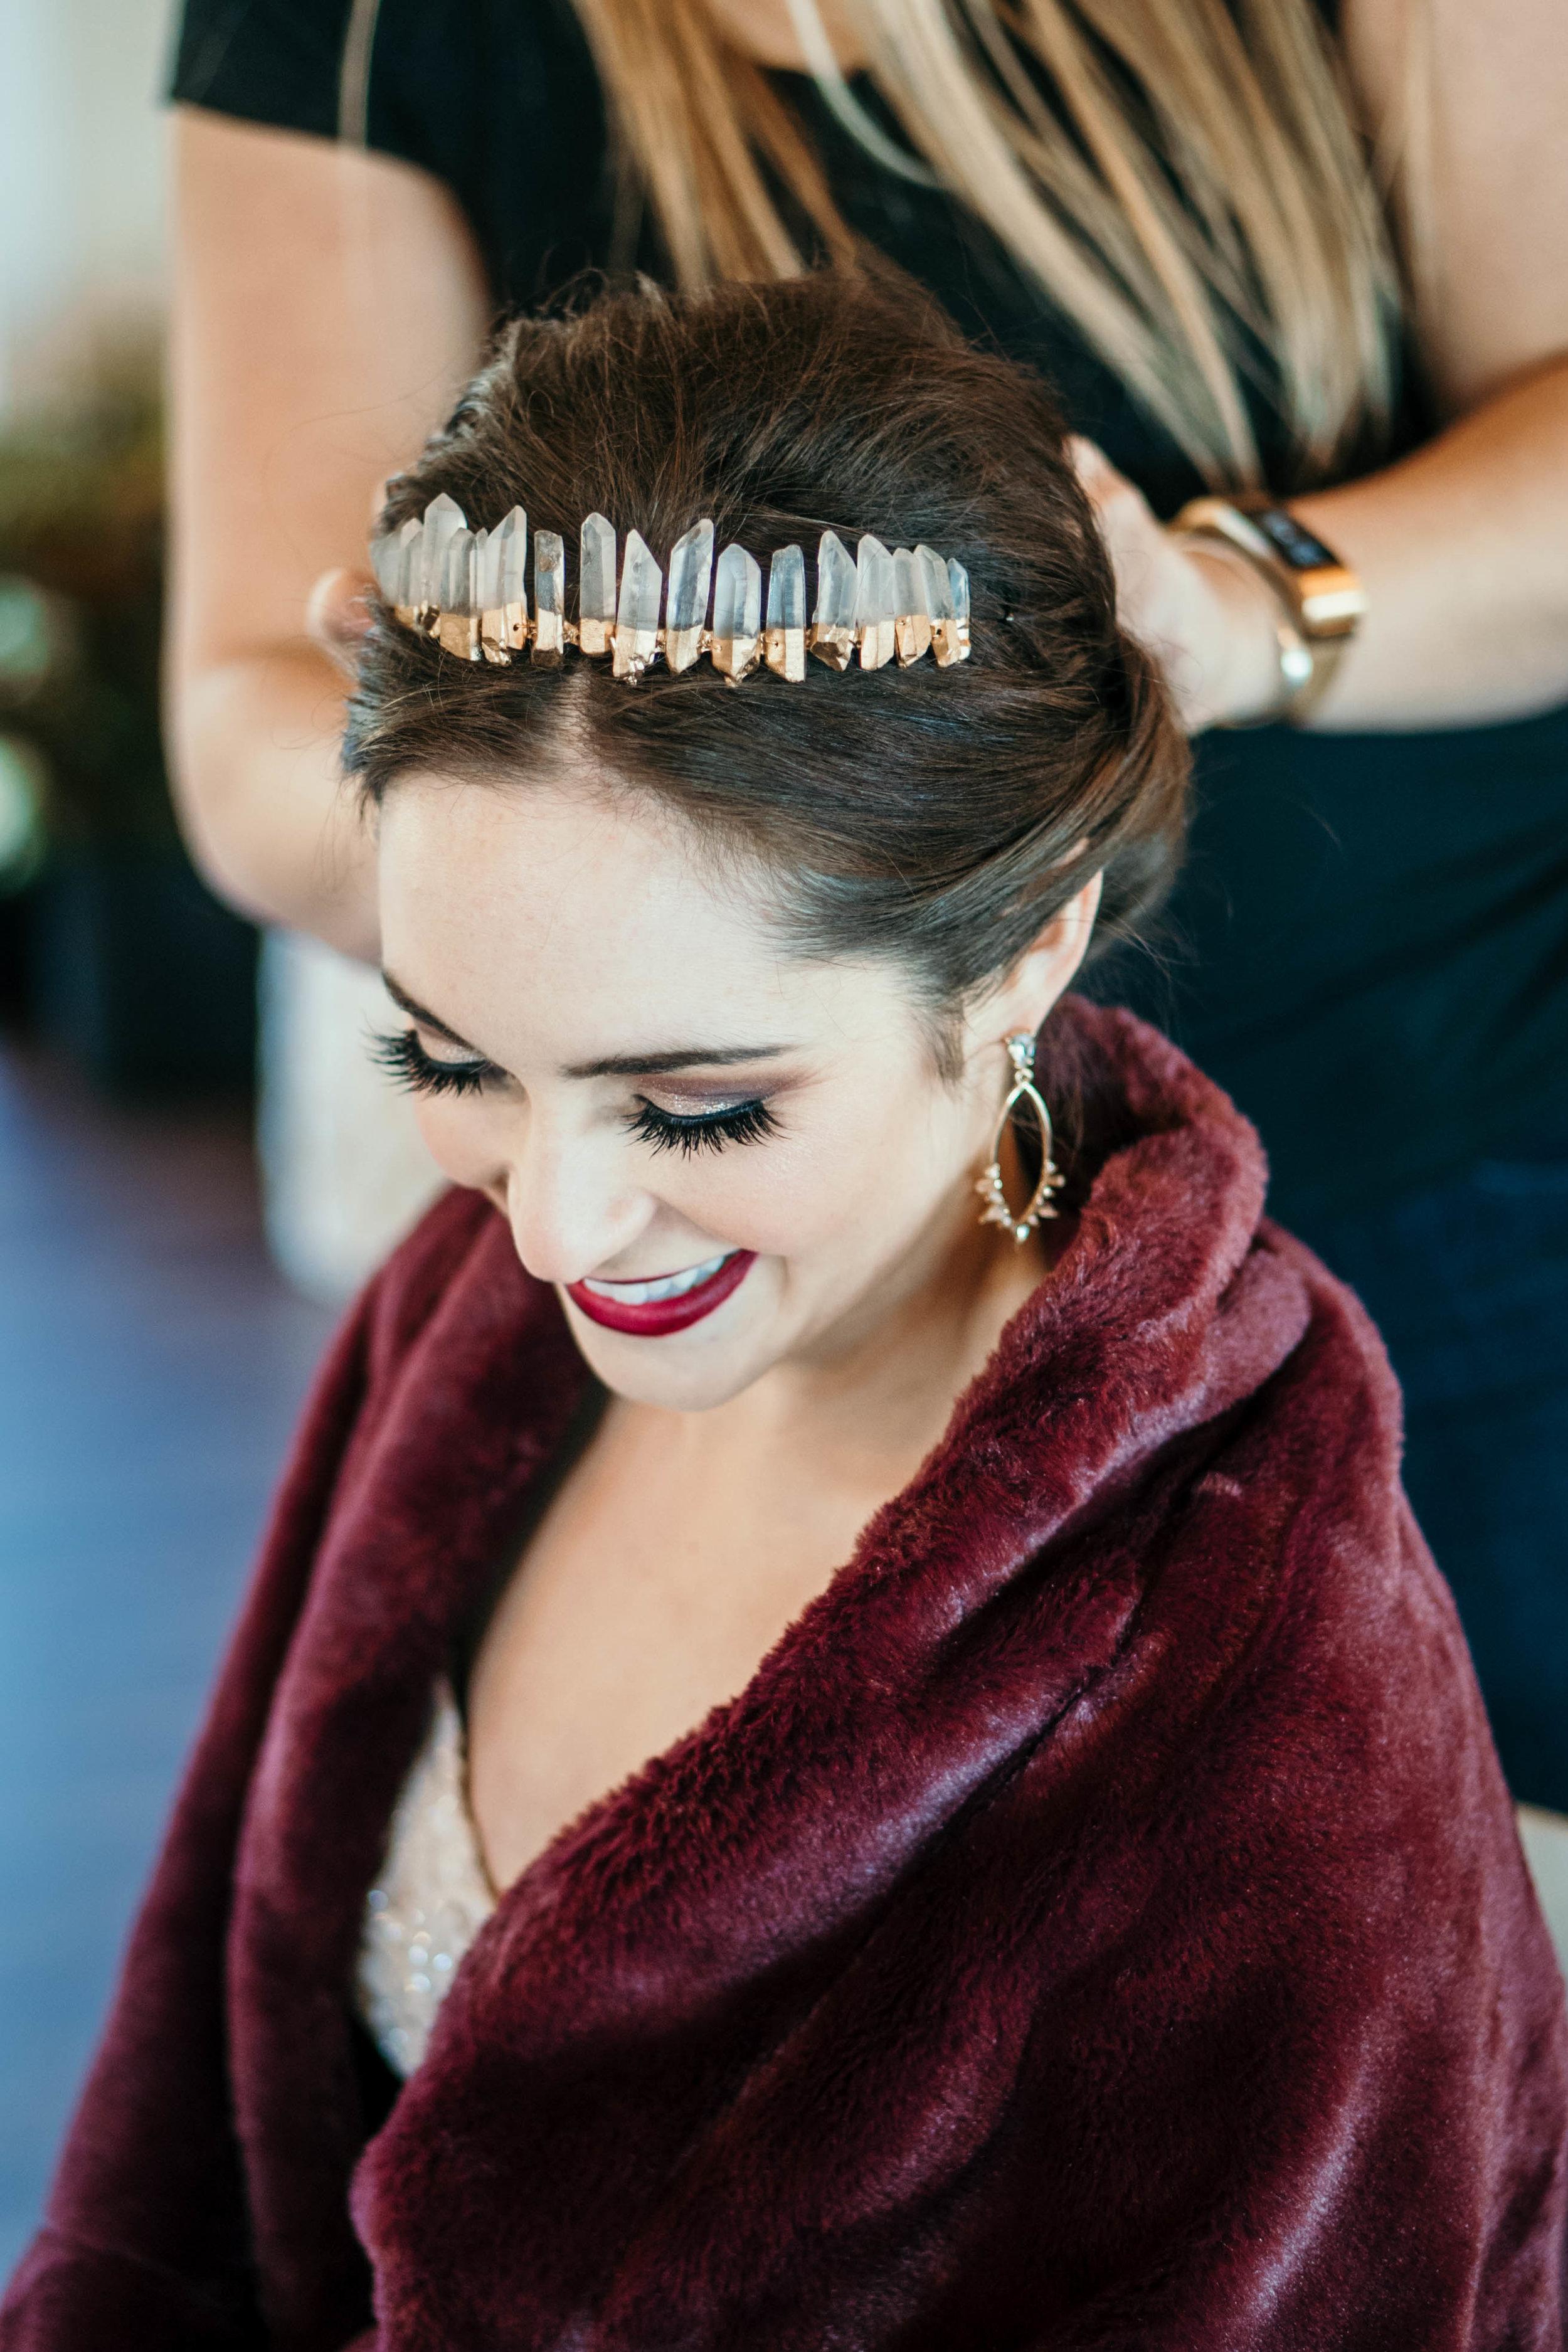 Austin Wedding Videographer - Dolls for Dolls (252 of 323).jpg